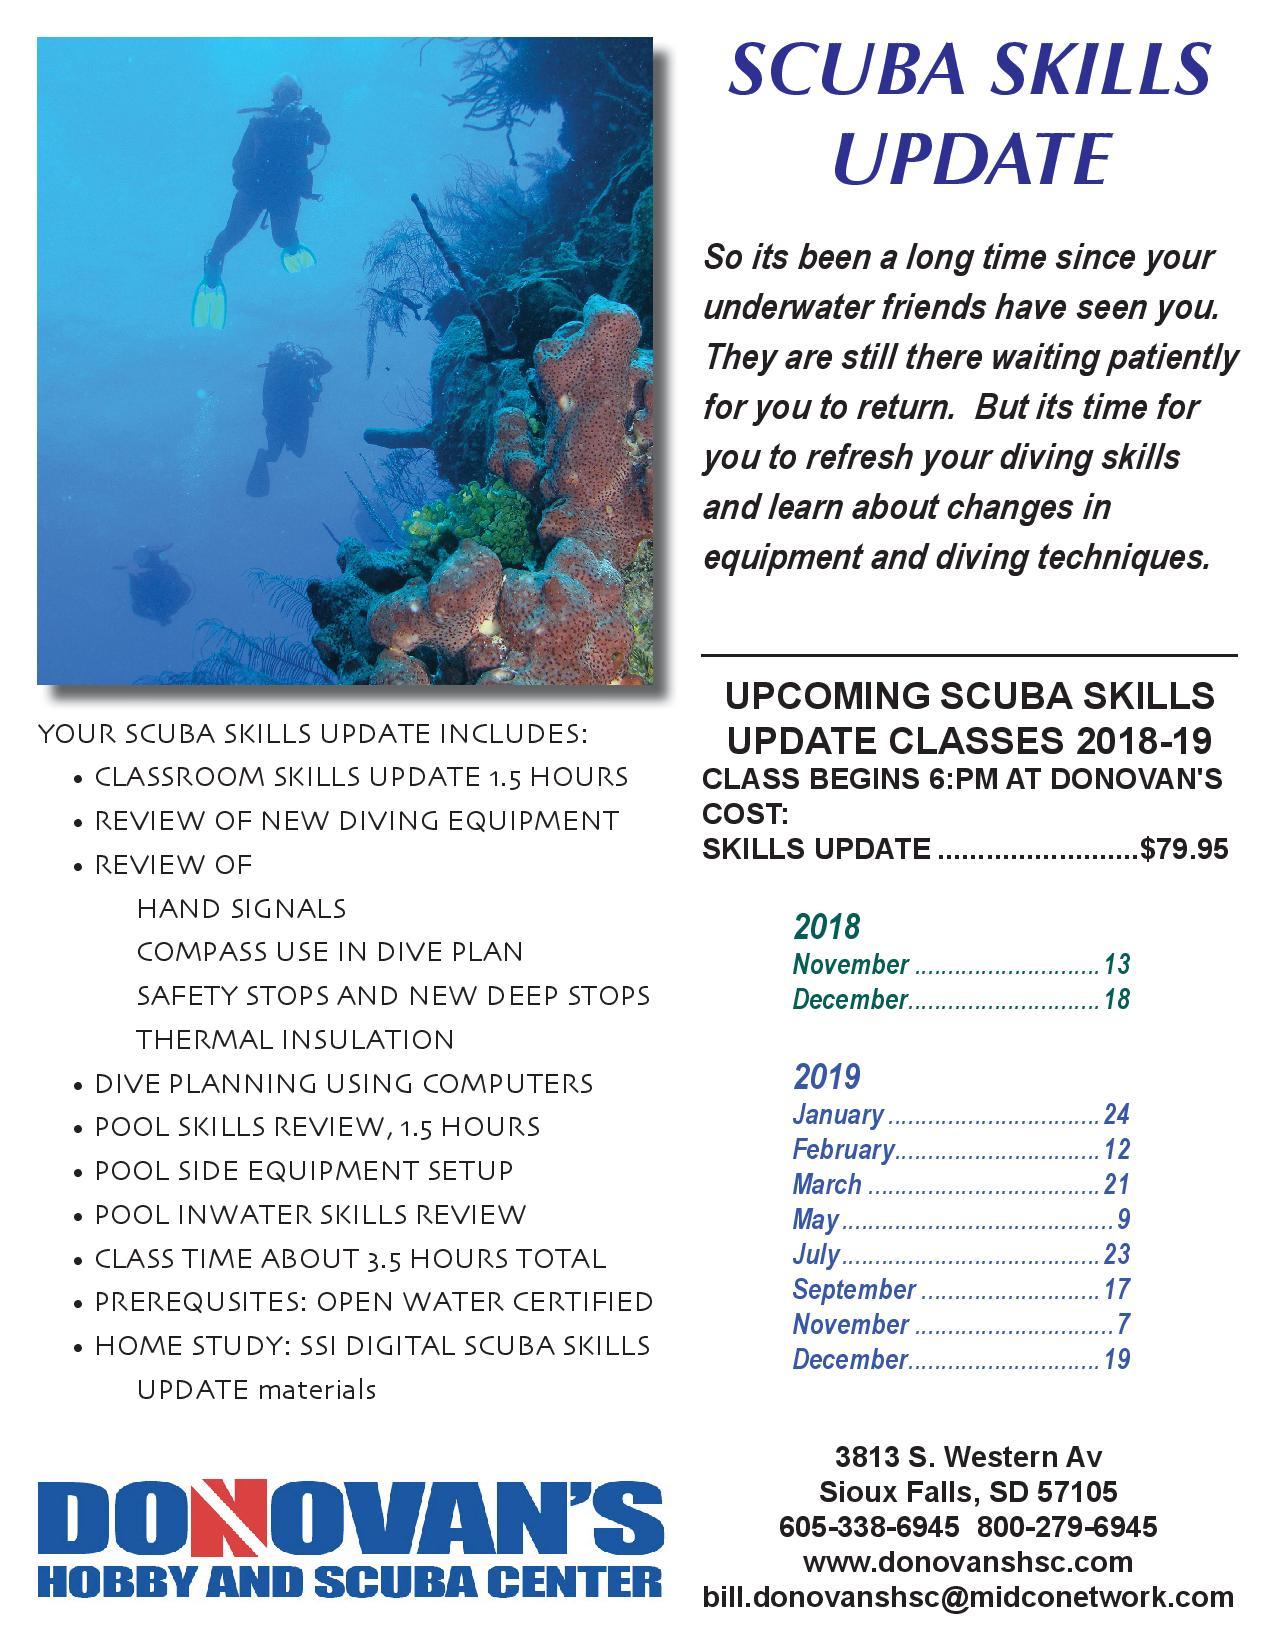 SCUBA SKILLS UPDATE poster 2019